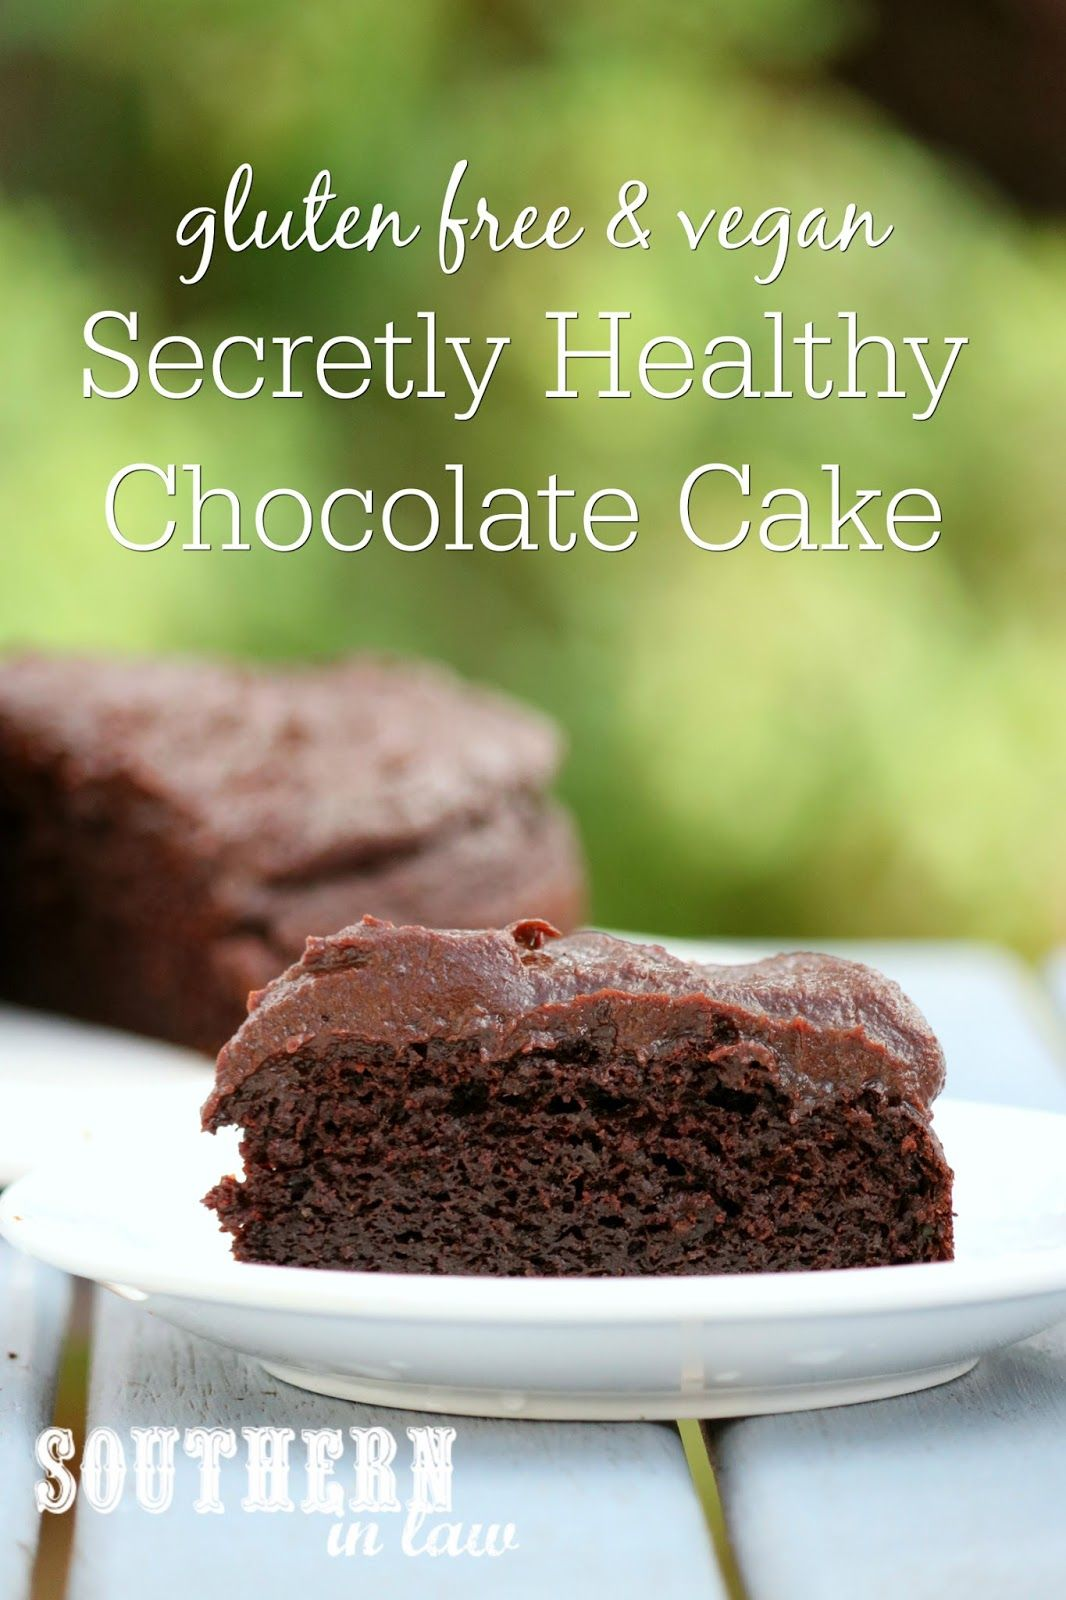 Recipe Secretly Healthy Chocolate Cake Gluten Free Vegan